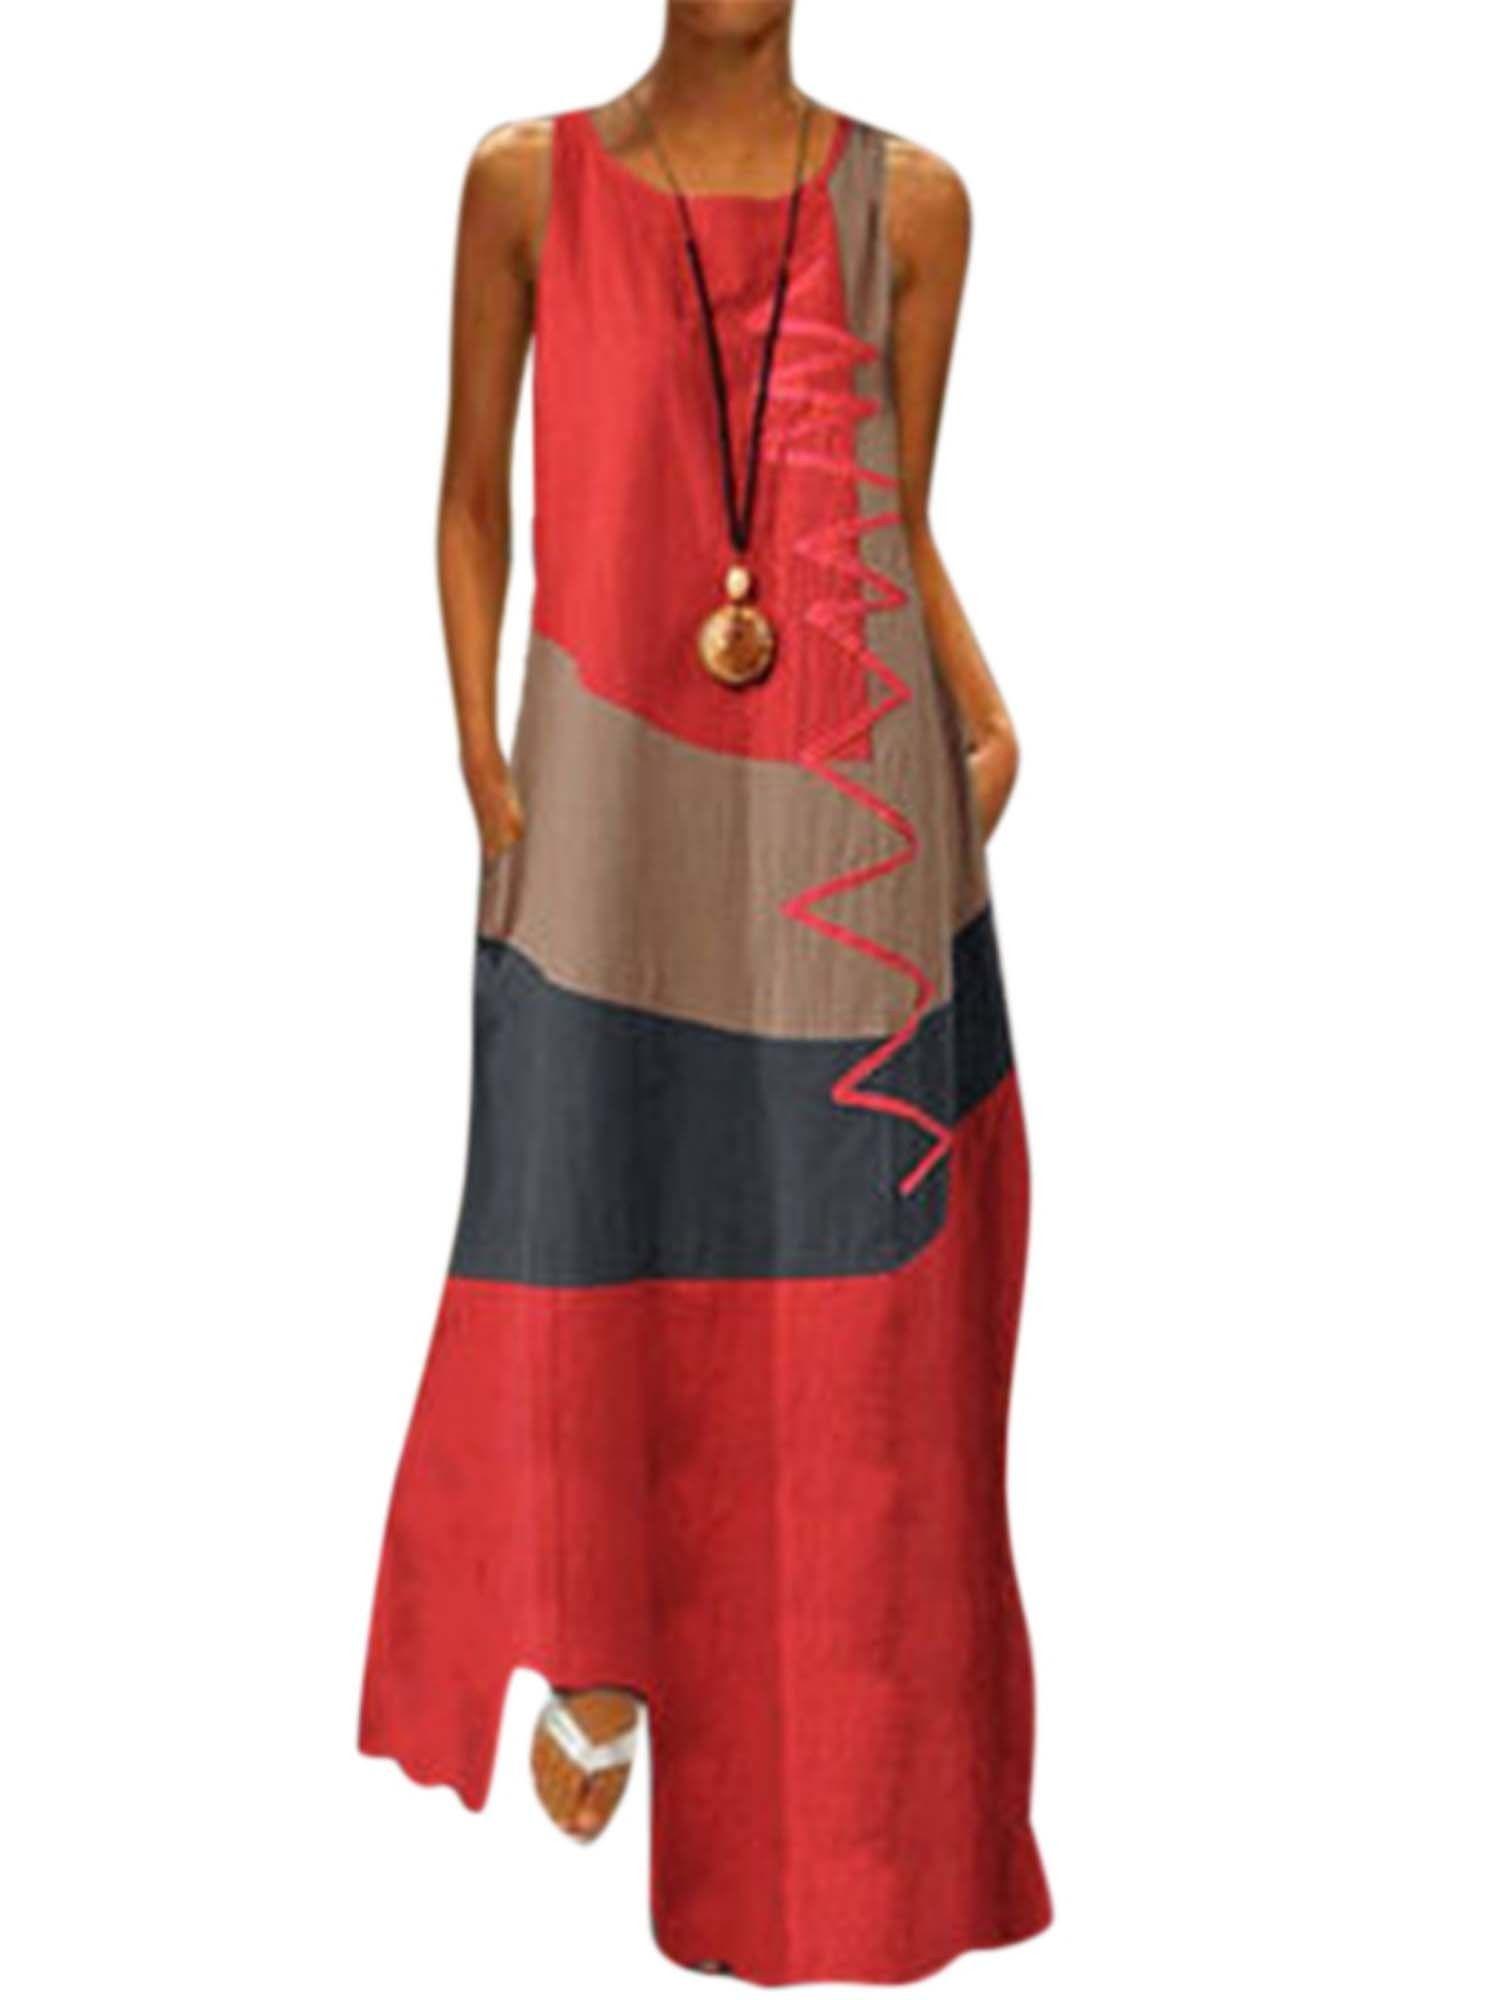 Lallc Women S Vintage Sleeveless Beach Maxi Dresses Plus Size Summer Loose Sundress Walmart Com In 2021 Maxi Dress Long Maxi Dress Women S A Line Dresses [ 2000 x 1500 Pixel ]